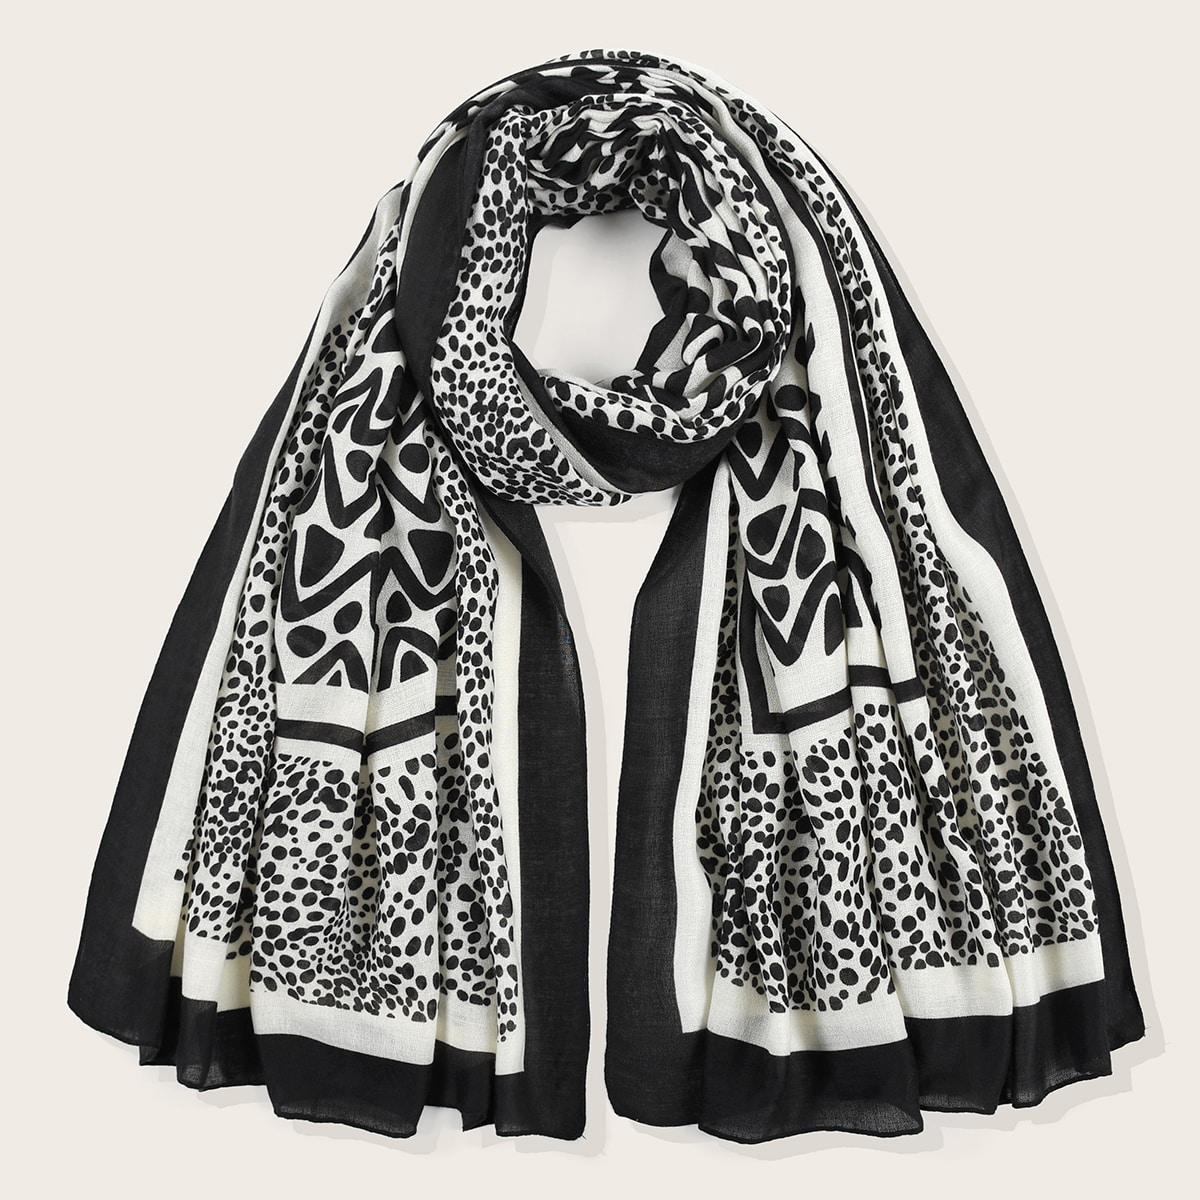 shein Polka Dot Pattern Sjaal